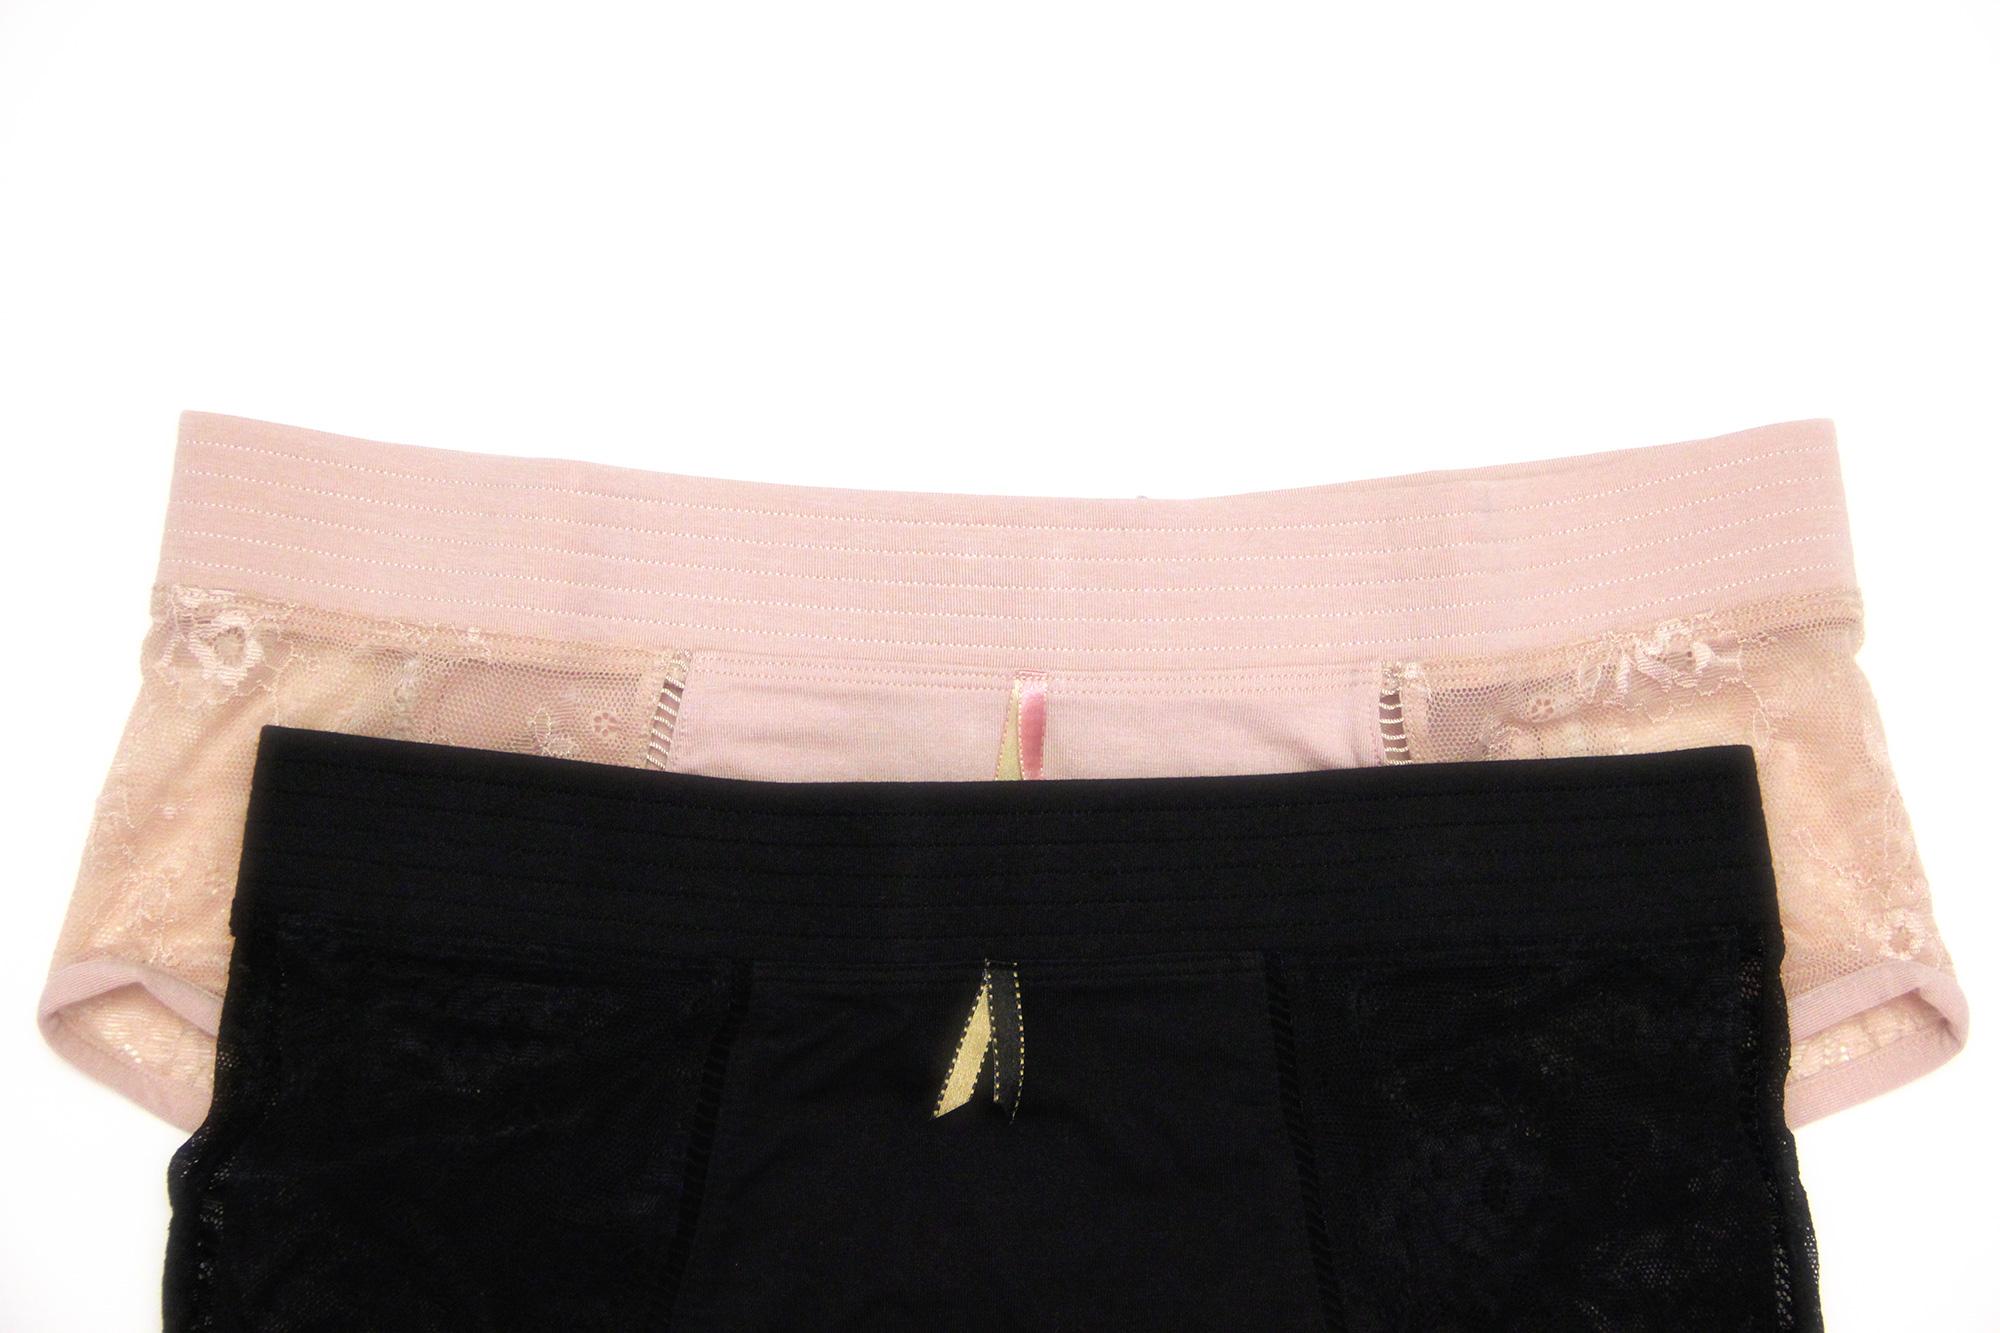 Обзор заказа нижнего белья от Made by Niki на GB {Garterblog.ru}